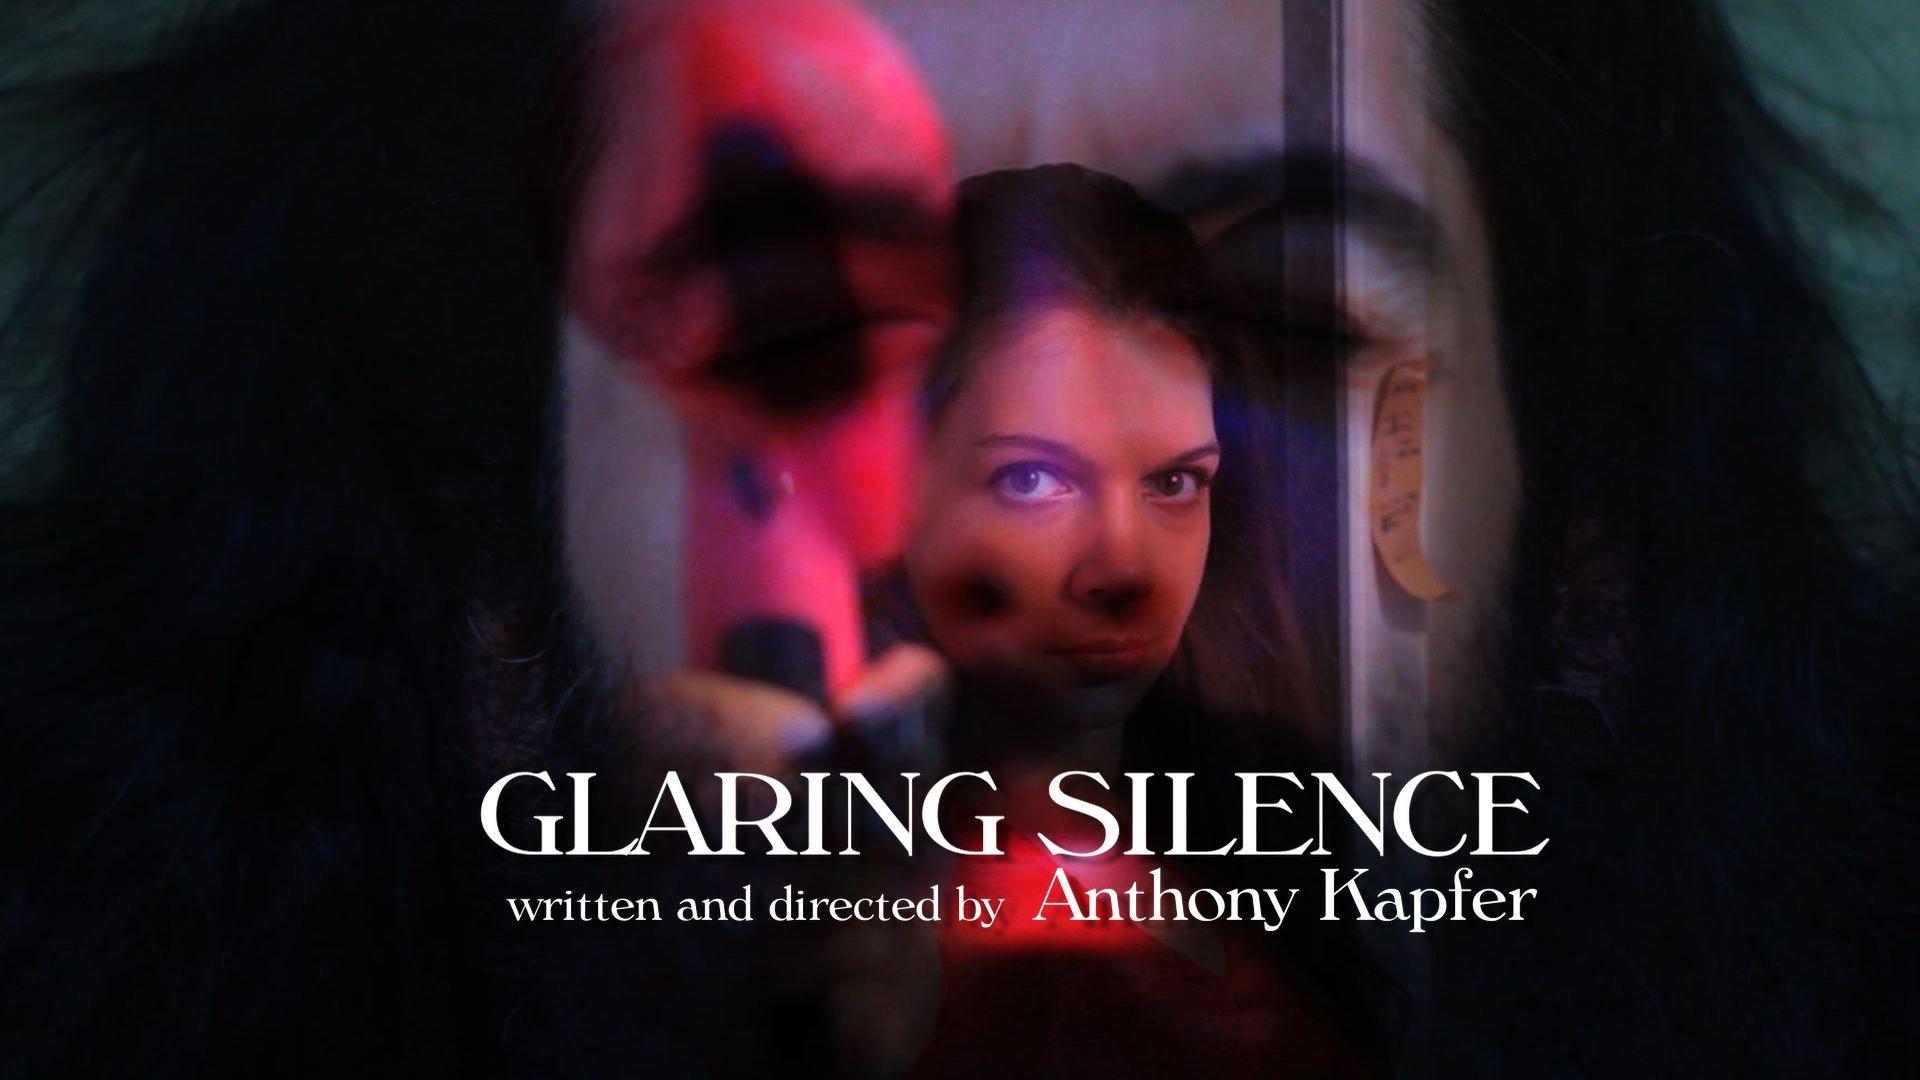 GLARING SILENCE